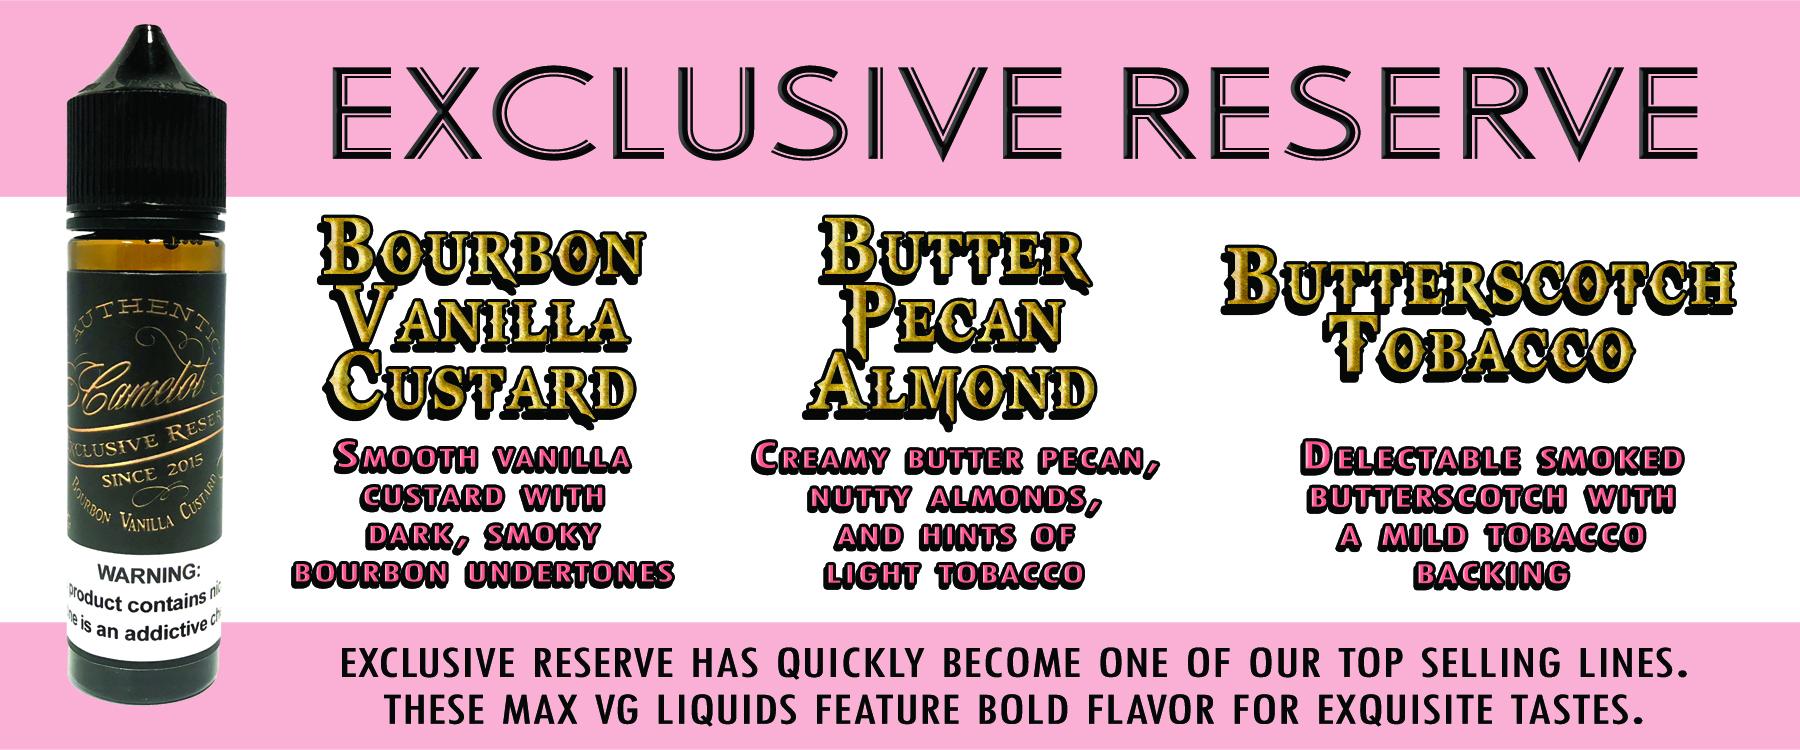 02-exclusive-reserve.jpg